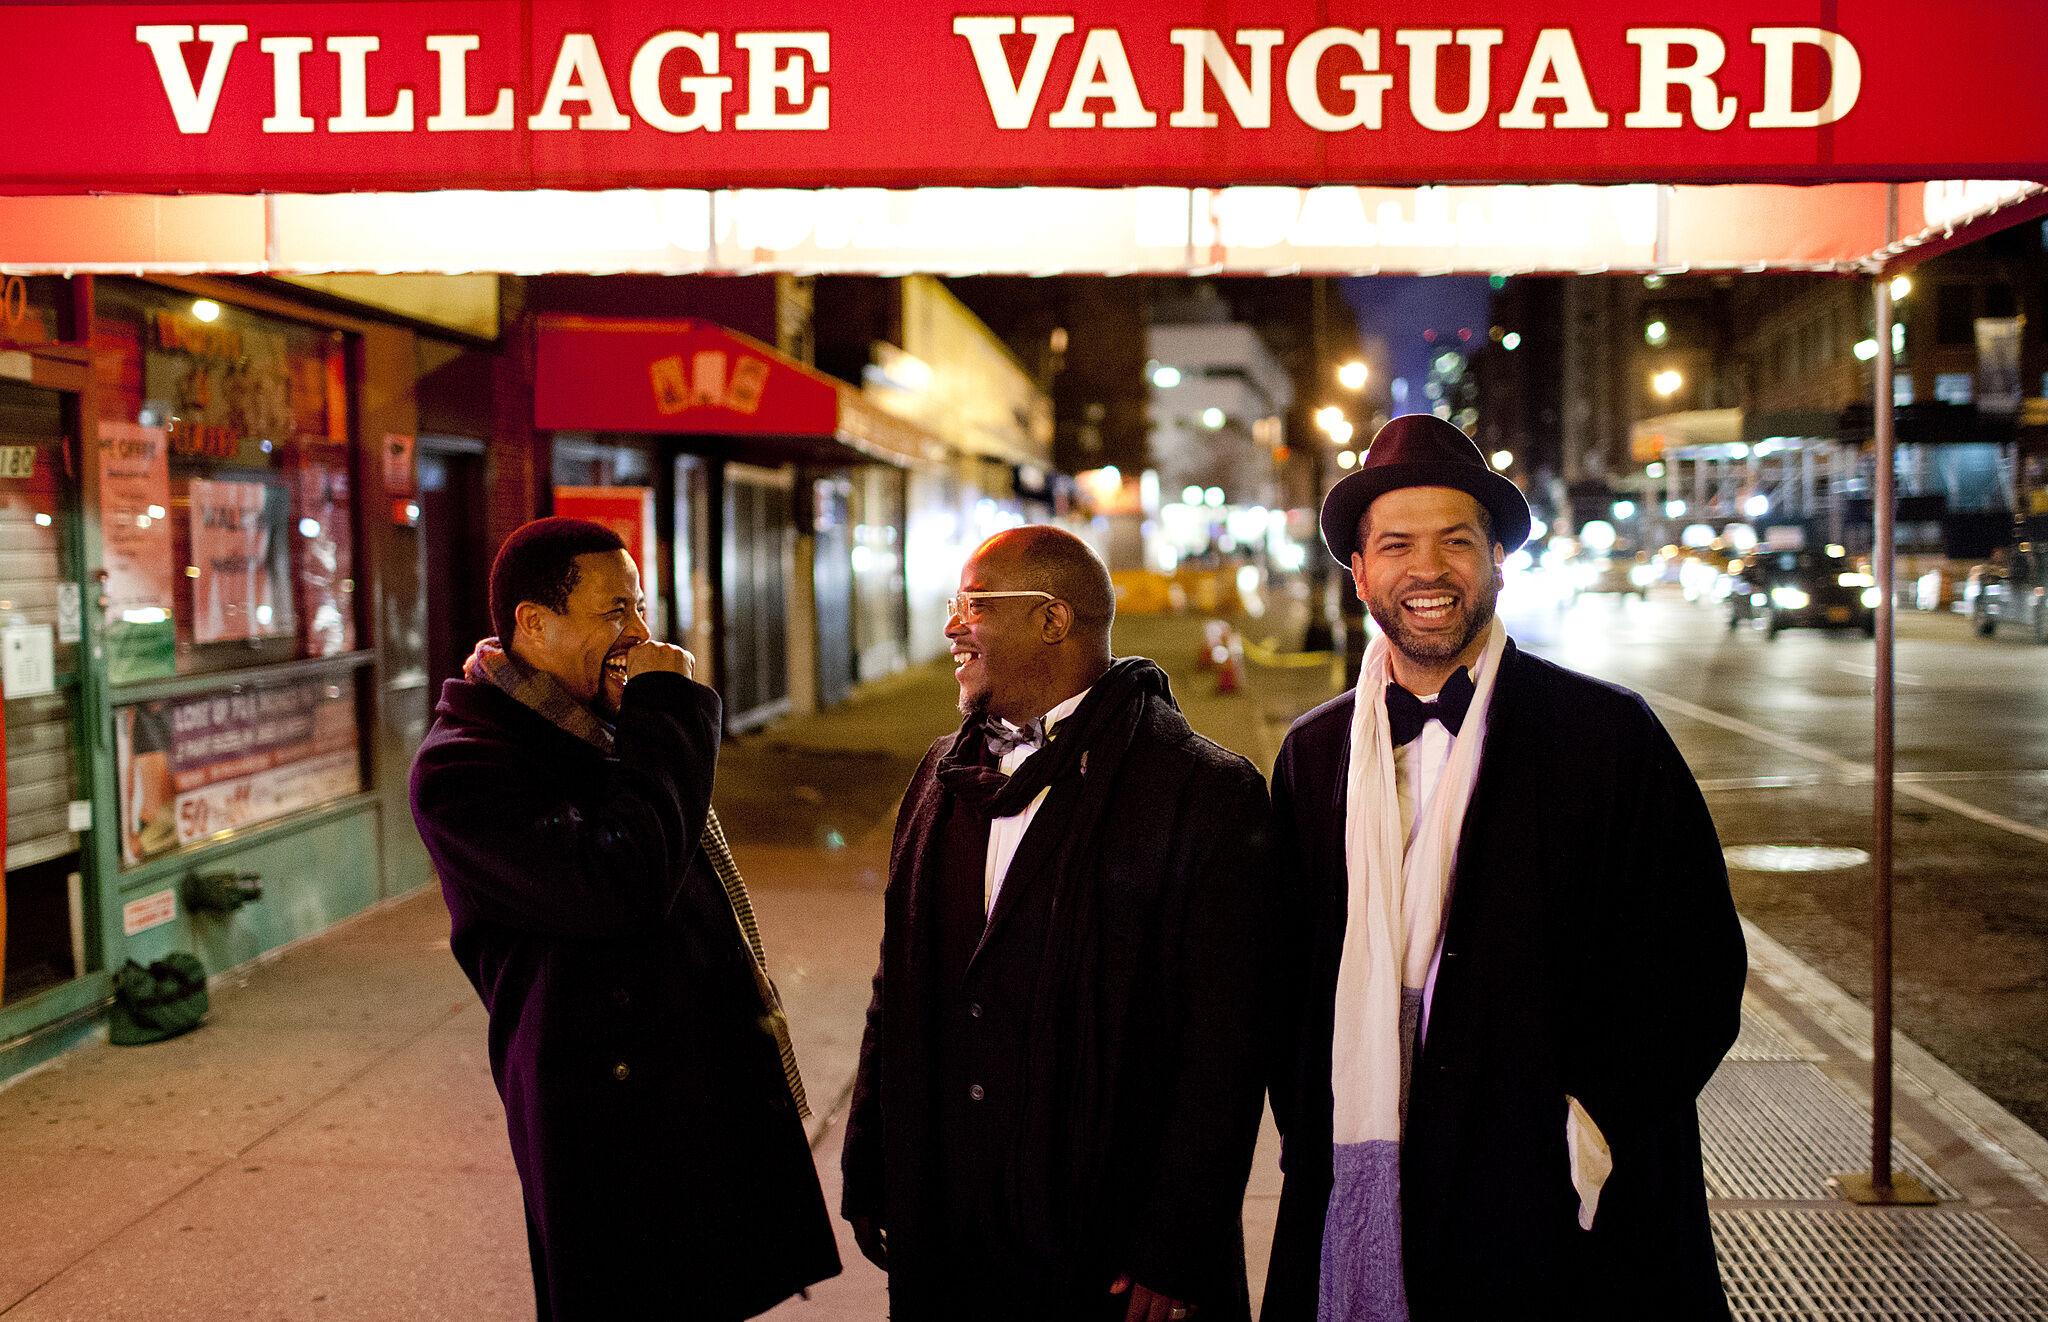 A photo of Nasheet Waits, Tarus Mateen, and Jason Moran outside the Village Vanguard